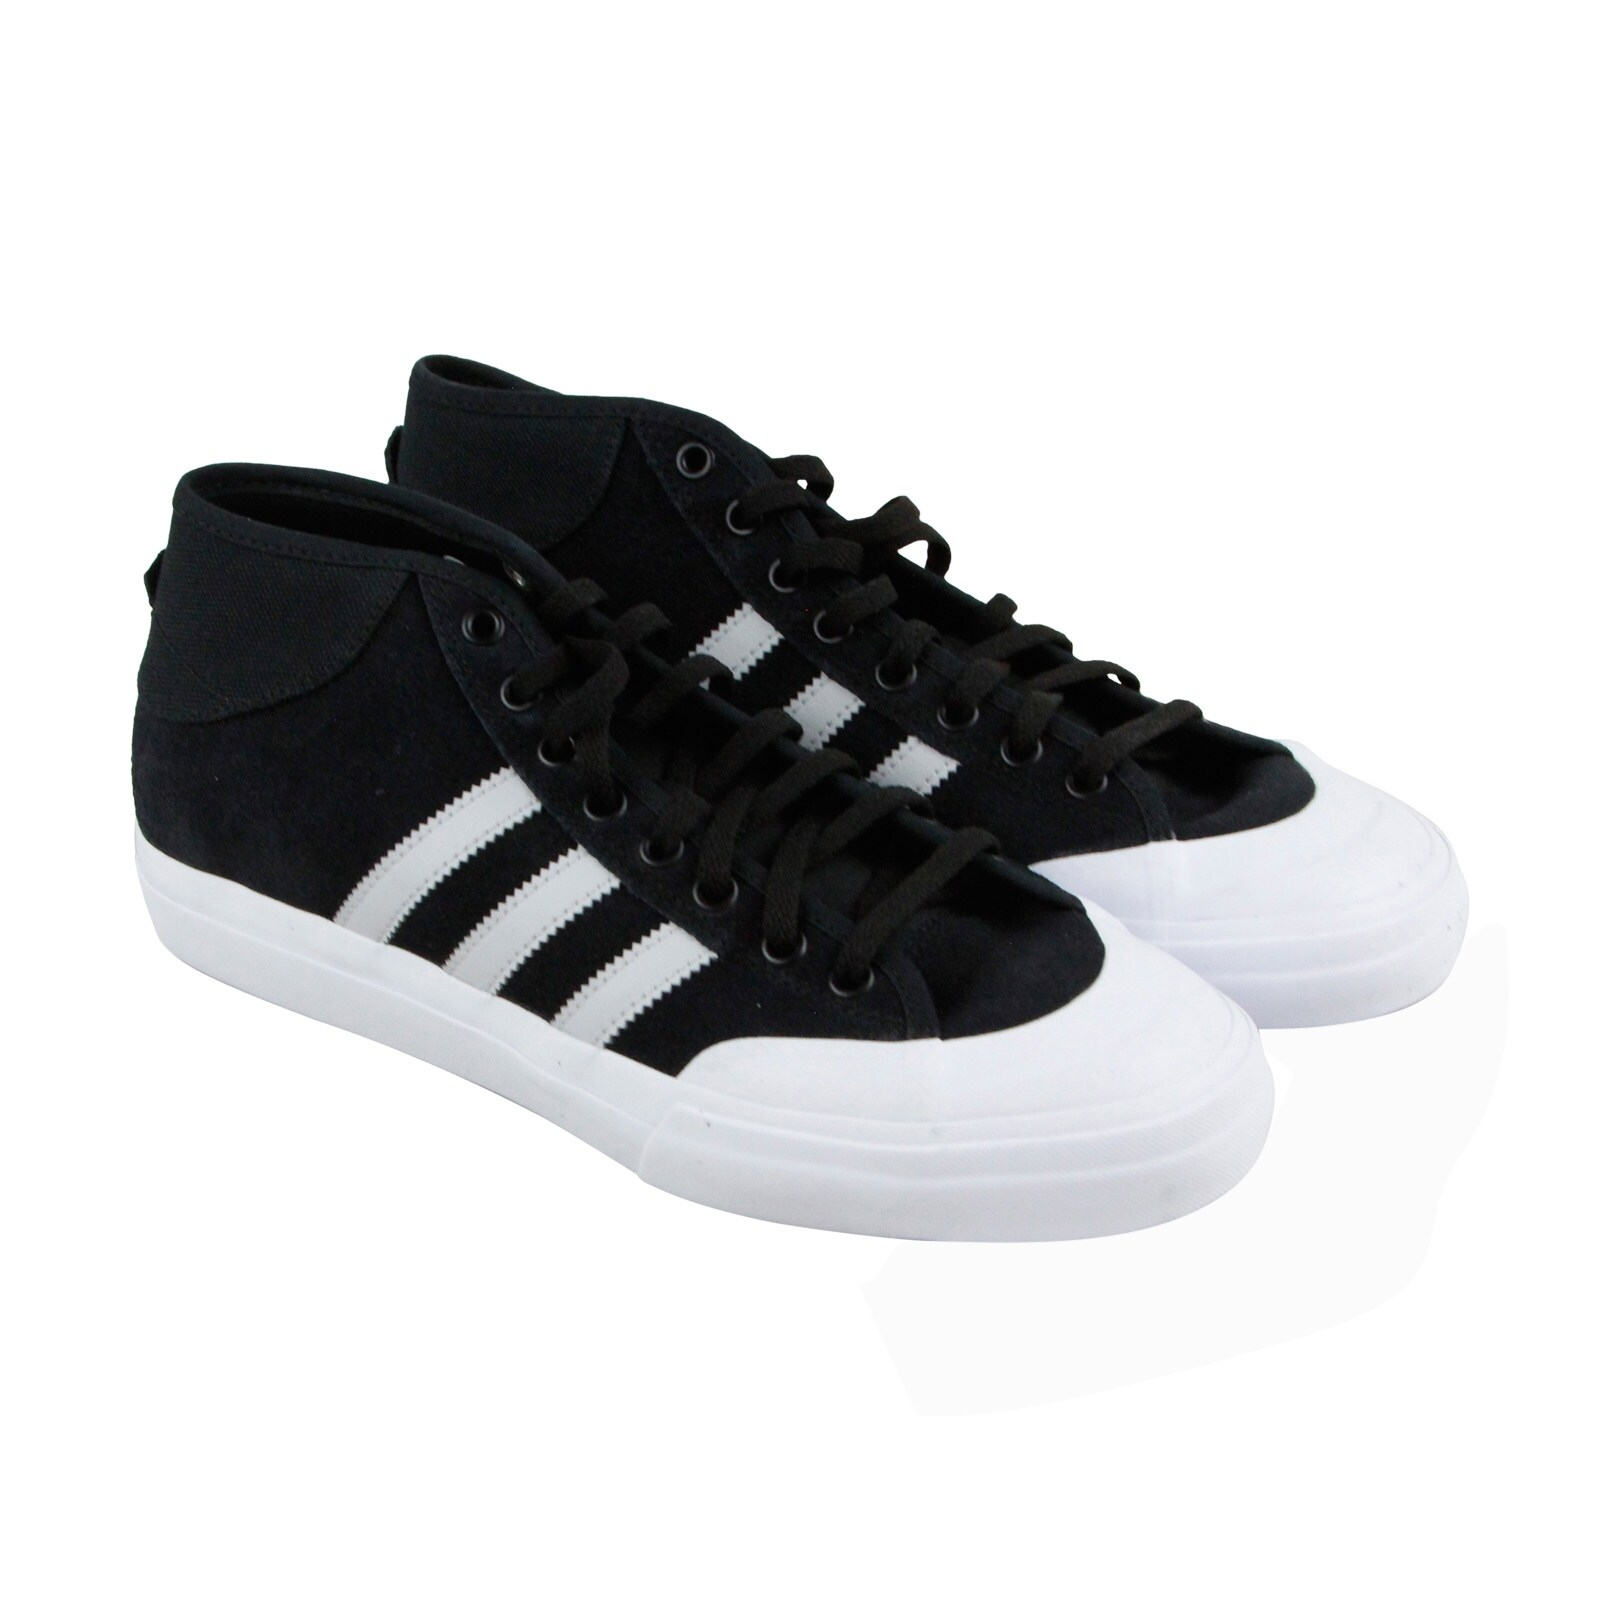 Shop Adidas Matchcourt Mid Mens Black